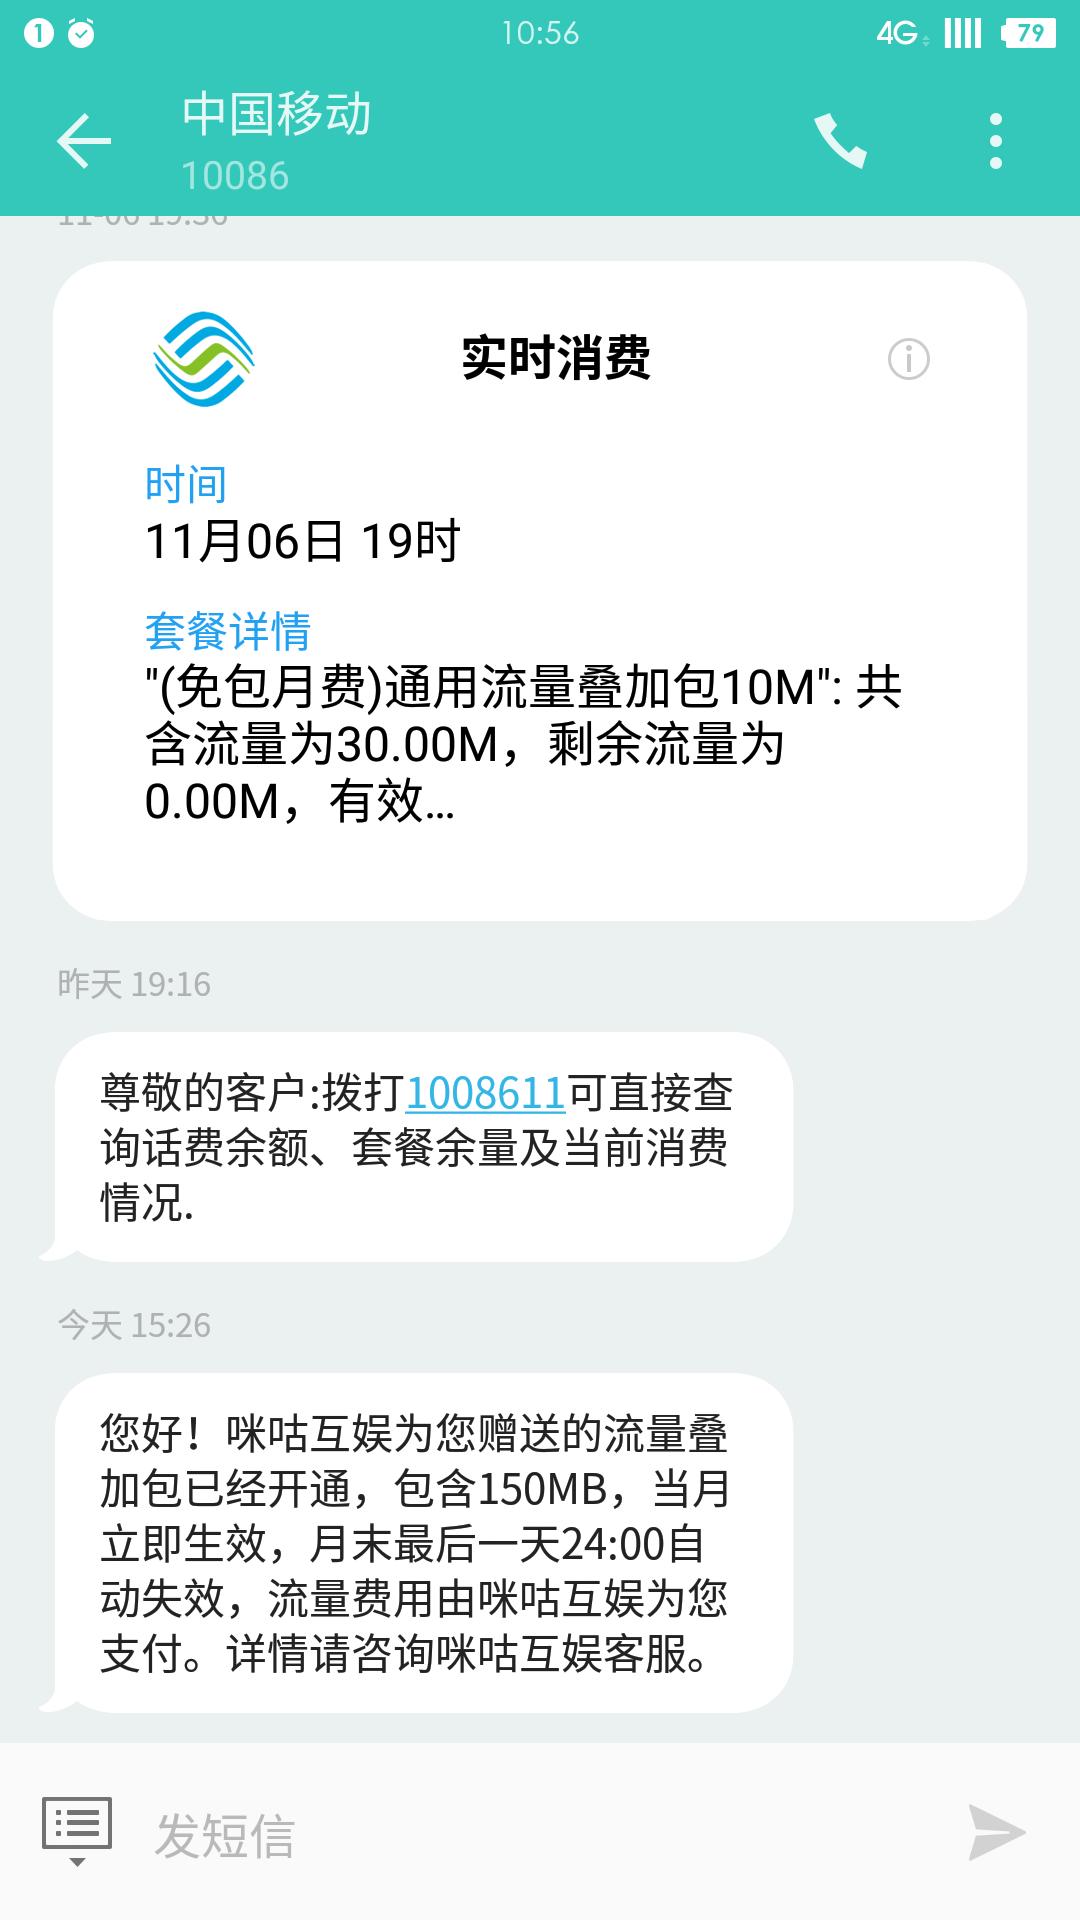 Screenshot_2015-11-10-10-56-29.png